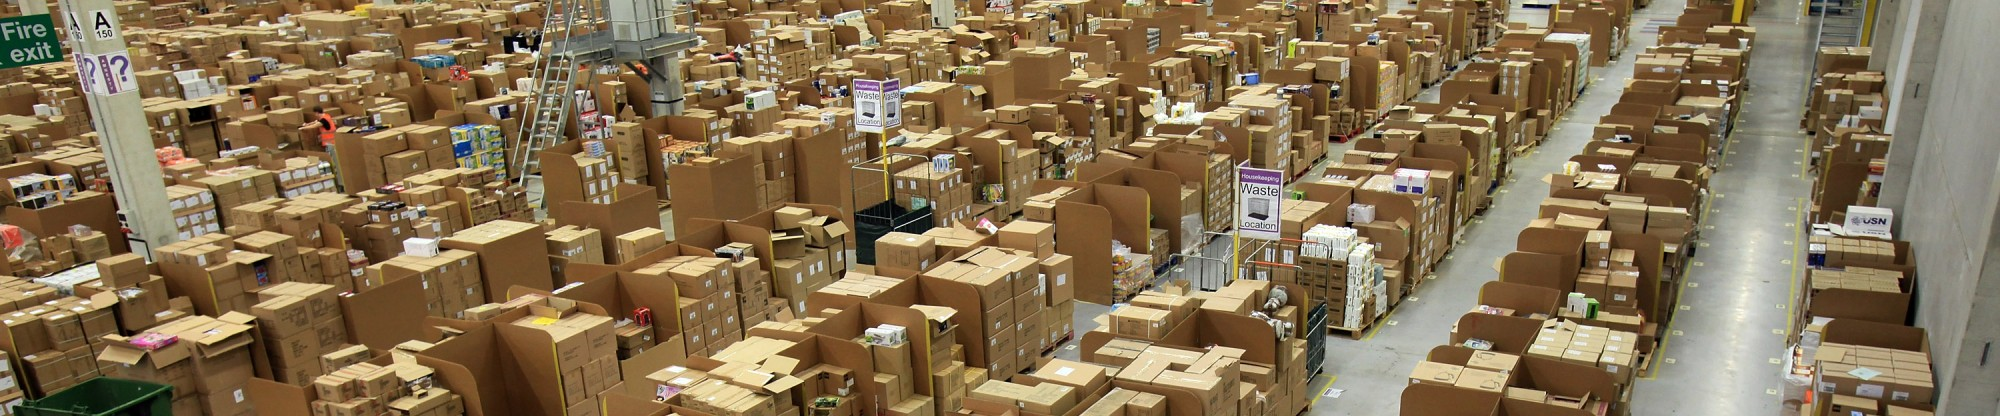 Warehouse Dock Worker Job Description Find warehouse jobs – Warehouse Receiving Job Description